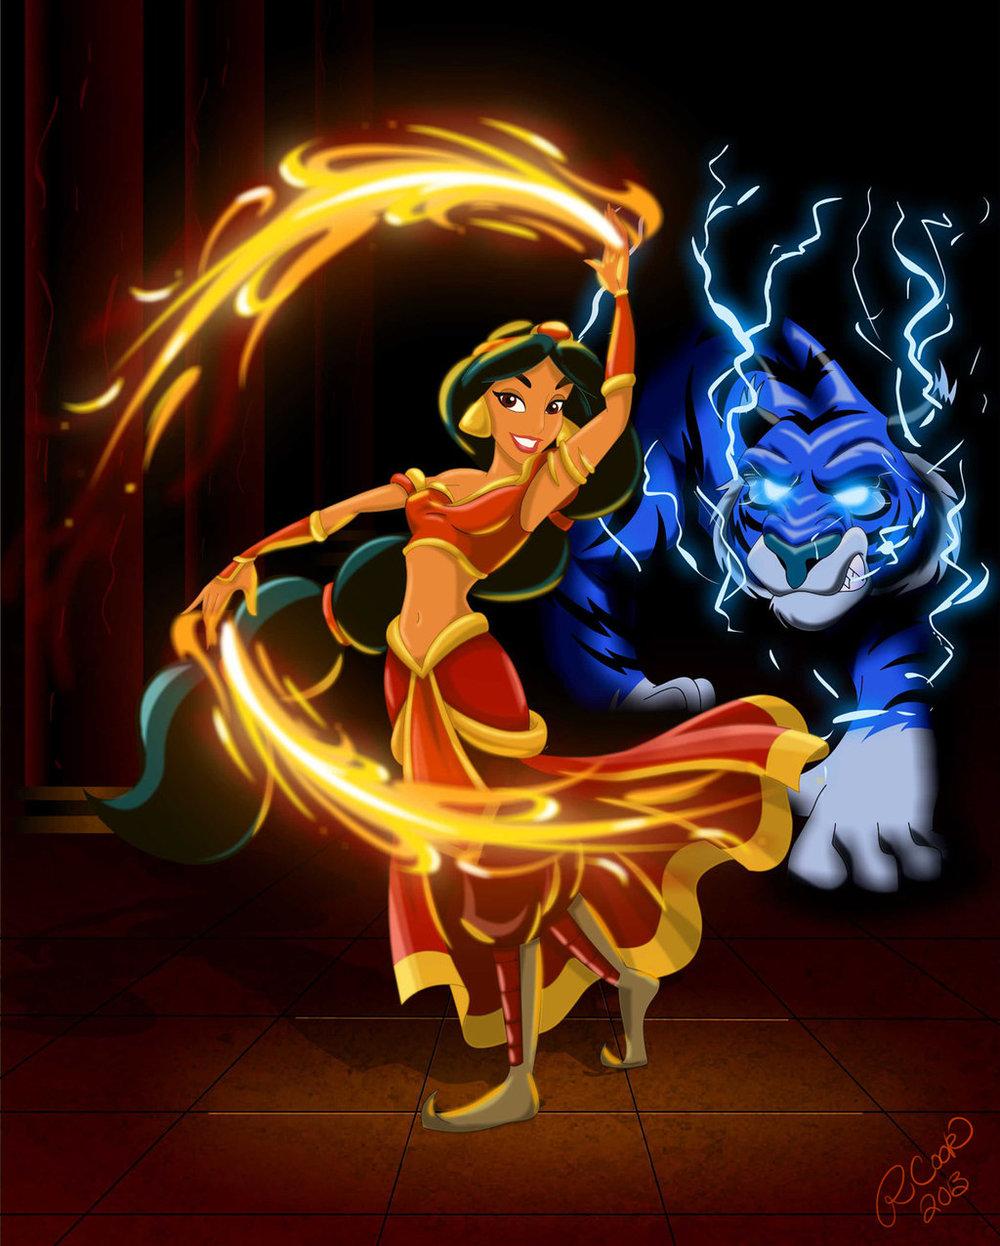 firebender_princess_jasmine_by_racookie3-d68ghe3.jpg